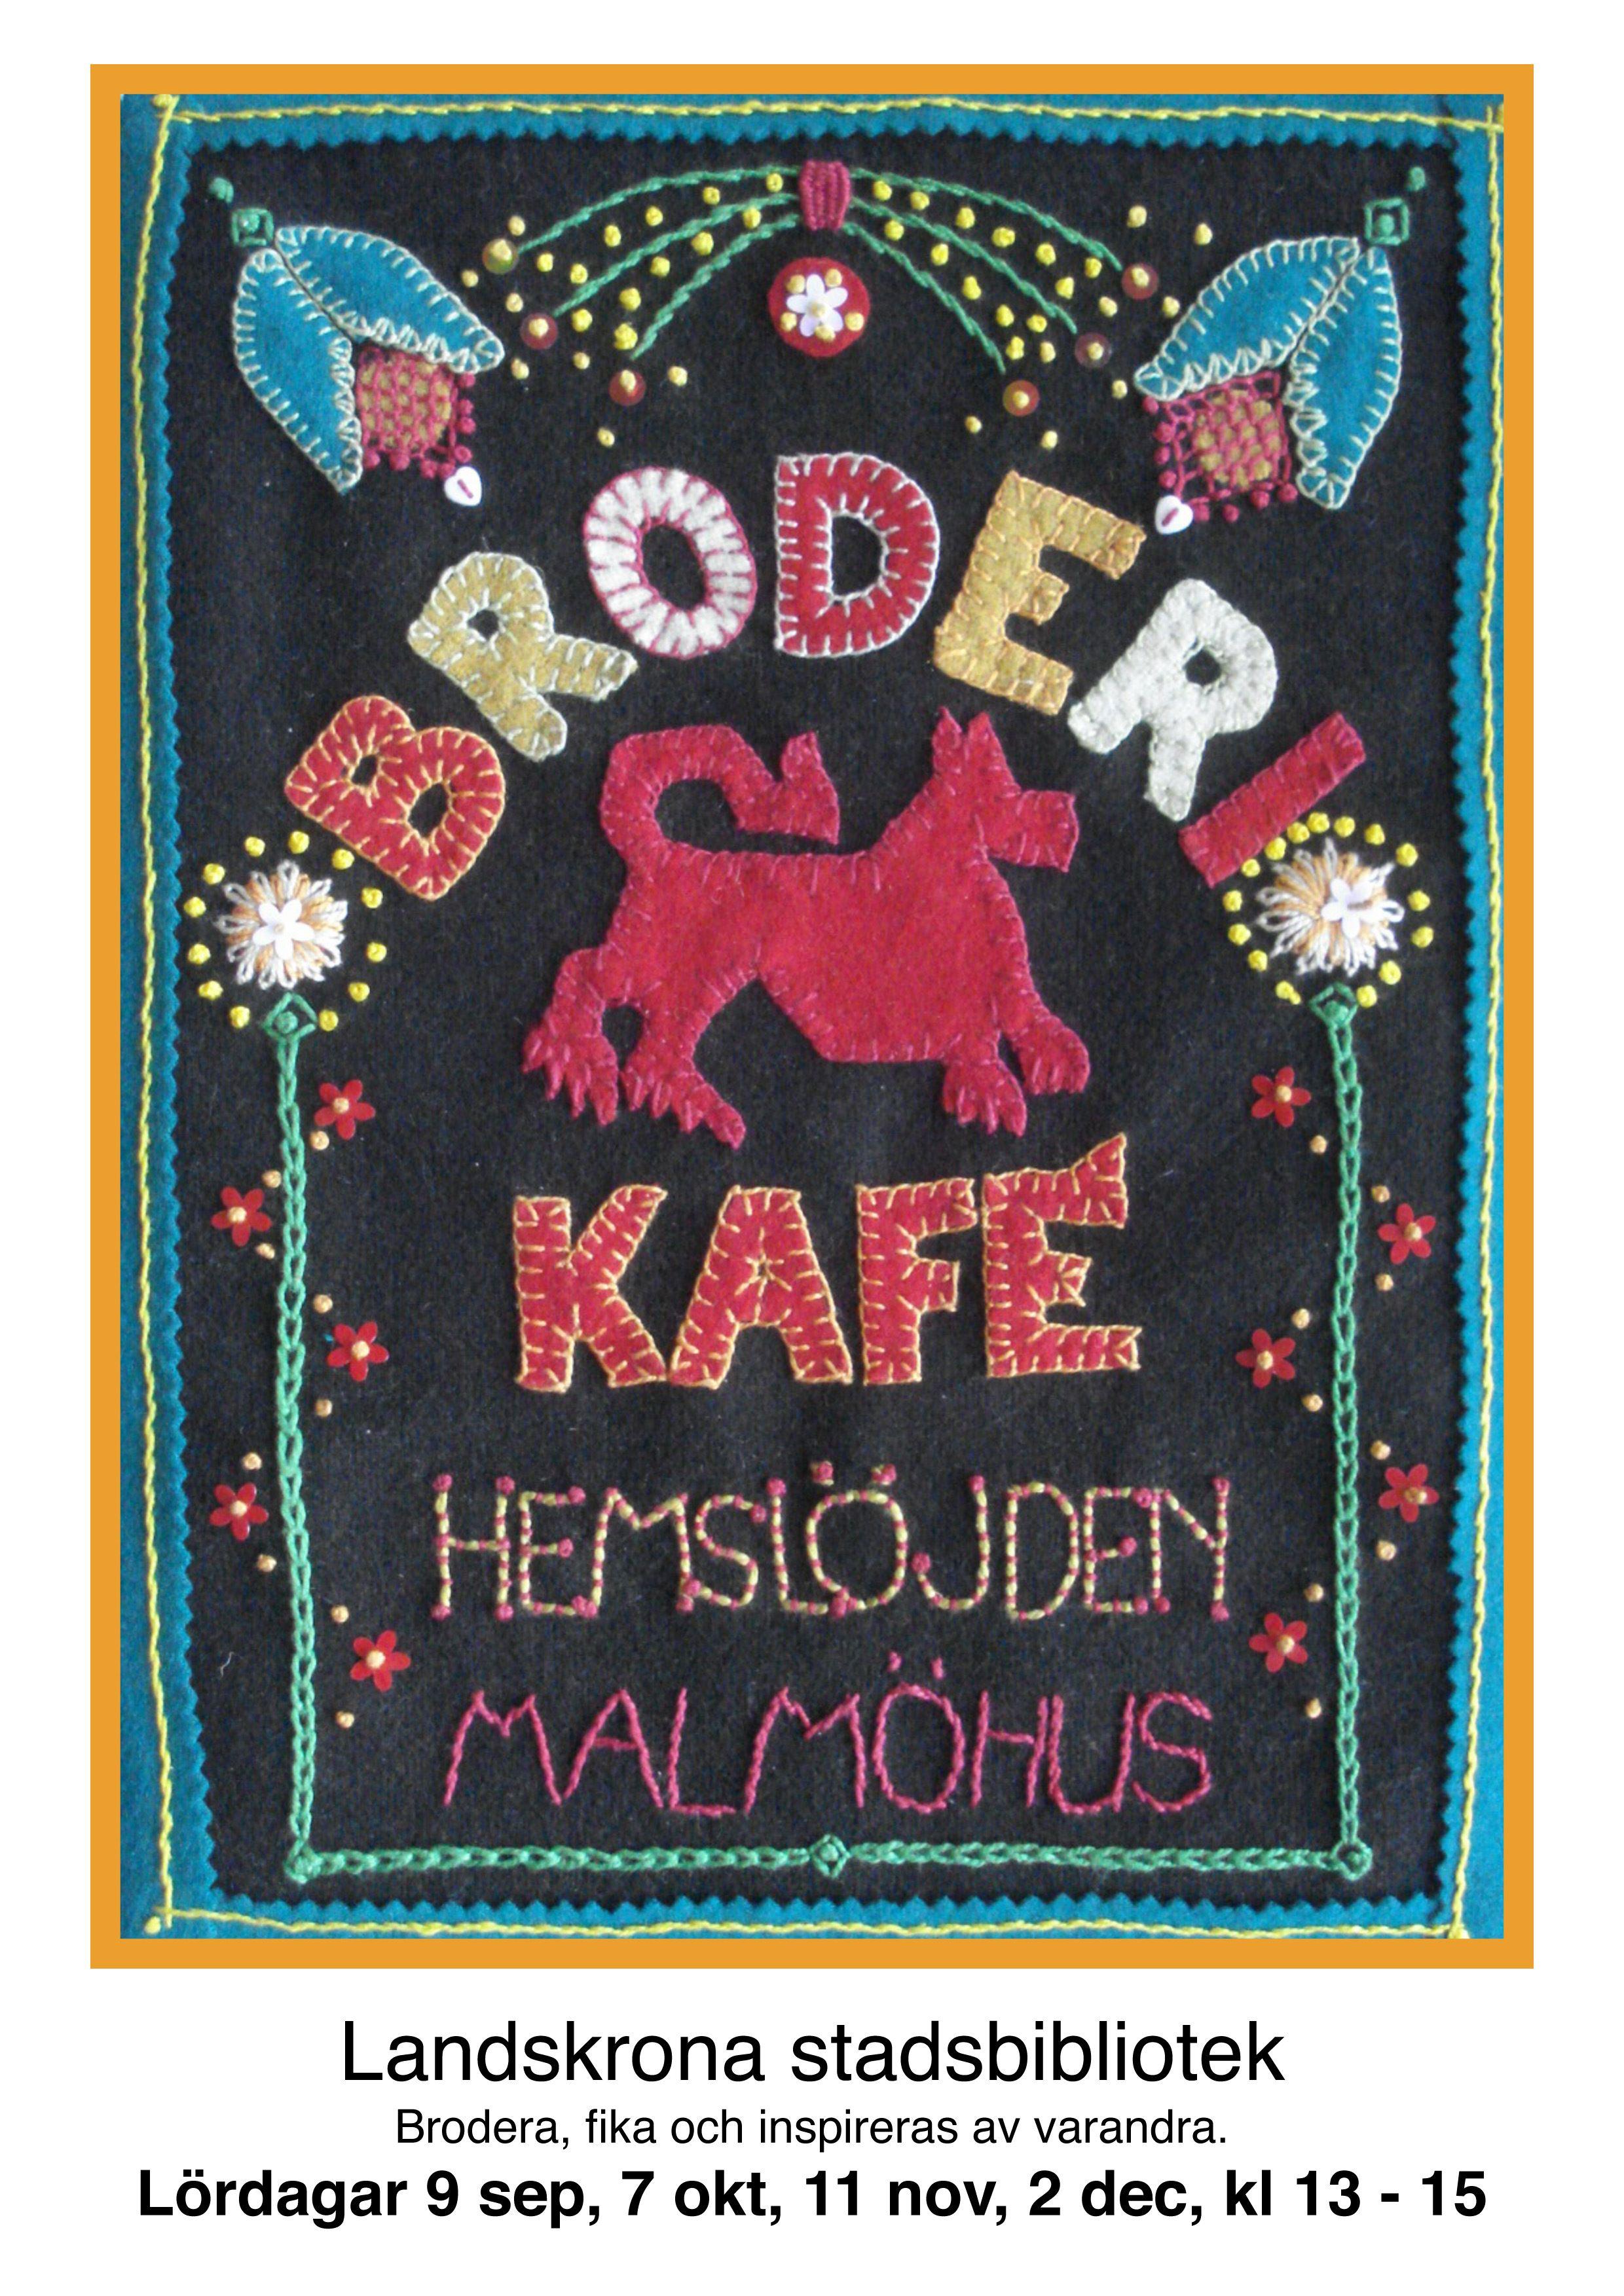 © Hemslöjden Malmöhus, Brodericafé